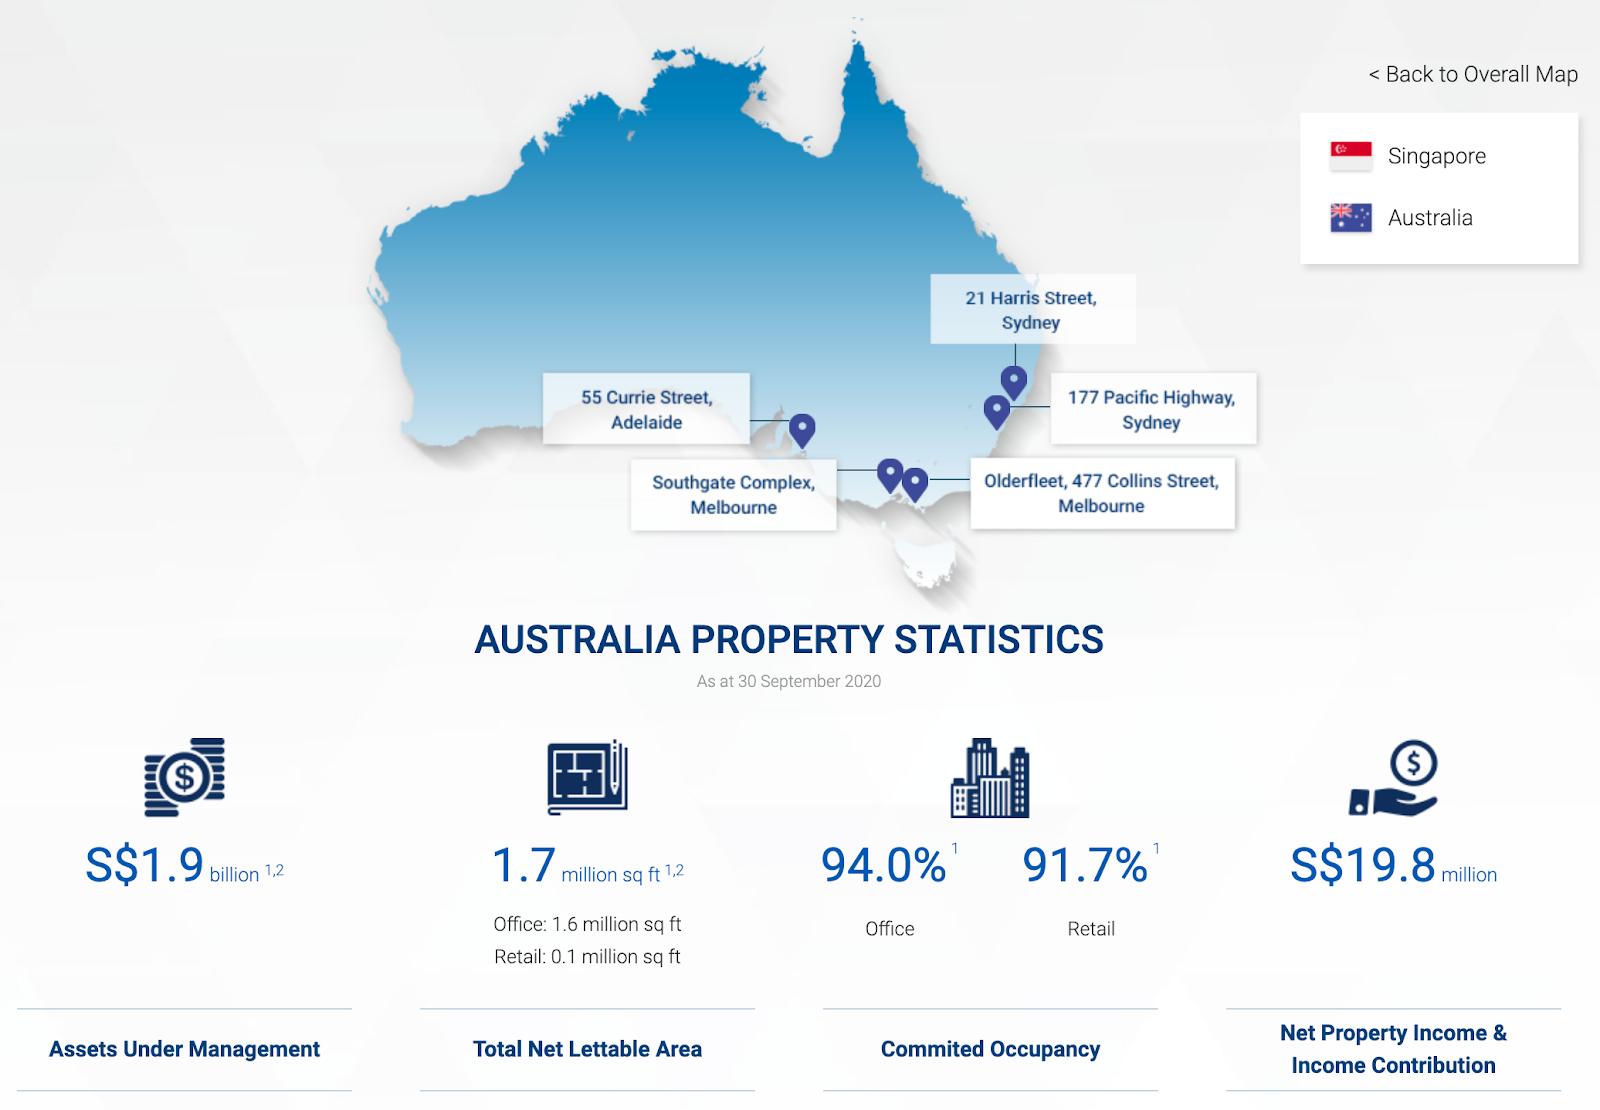 Suntec REIT - Australia Property Statistics